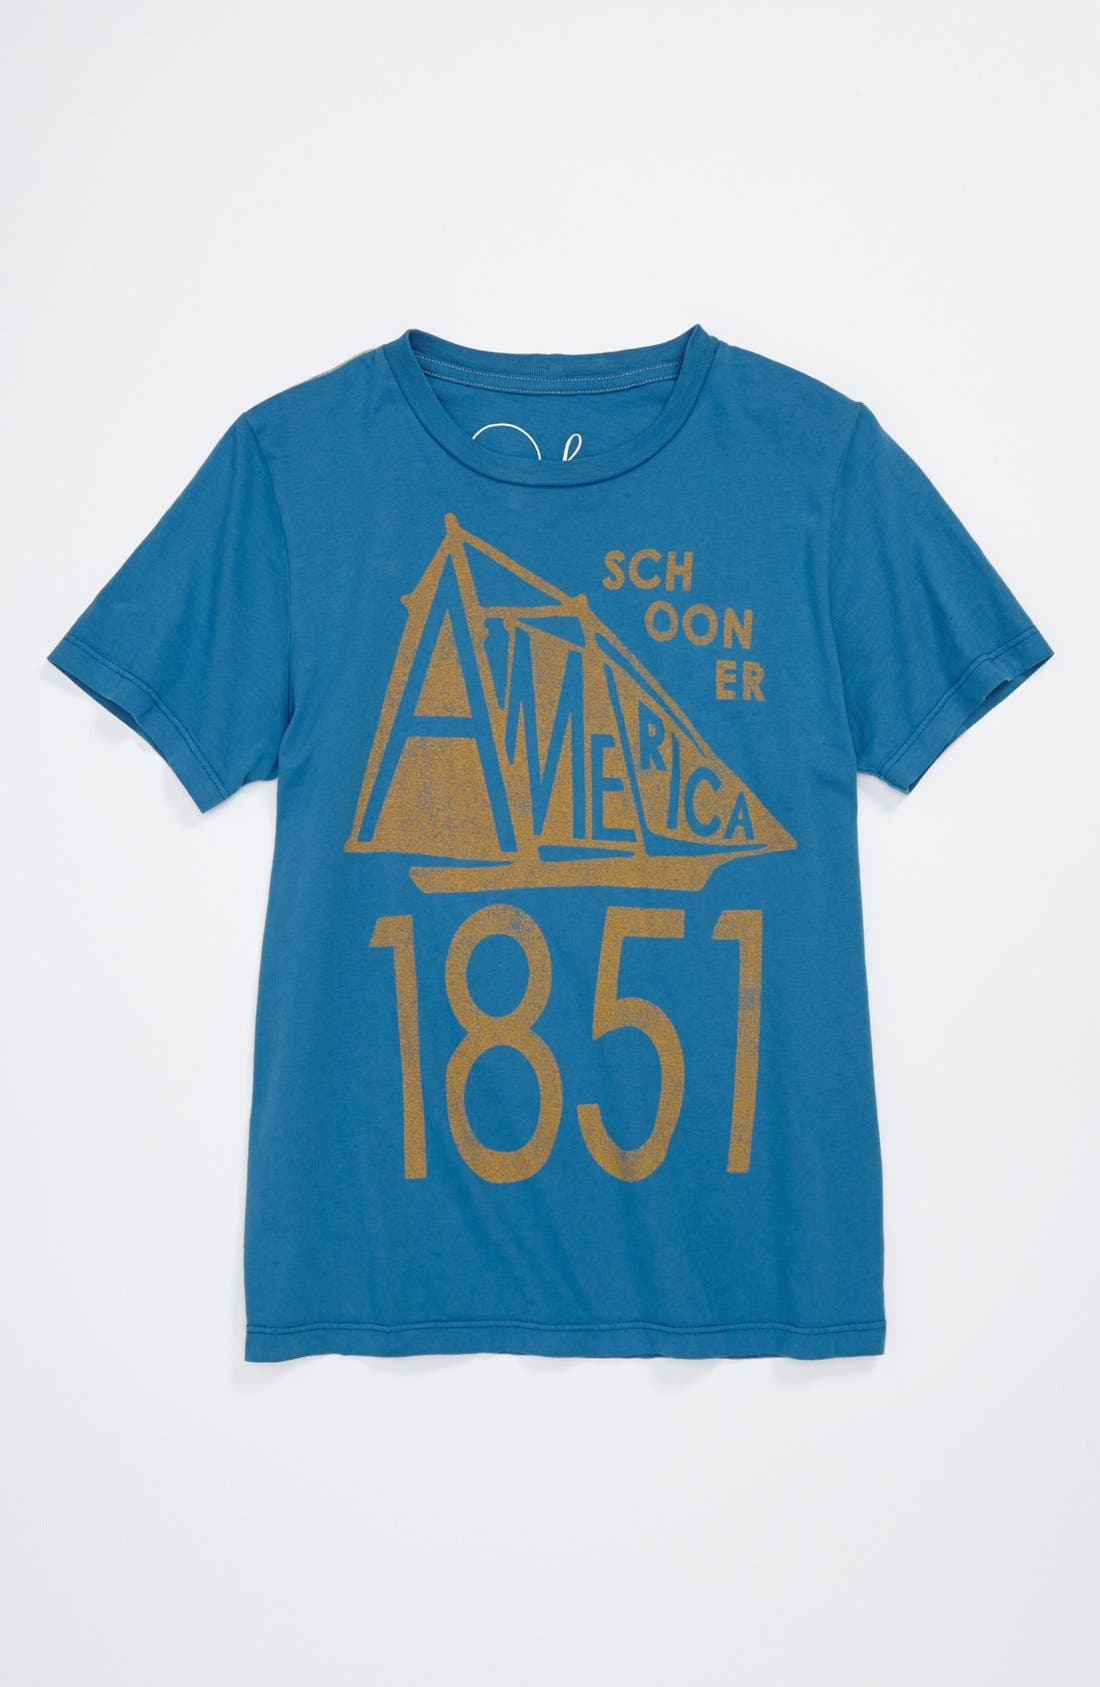 Alternate Image 1 Selected - Peek 'America' T-Shirt (Toddler Boys, Little Boys & Big Boys)